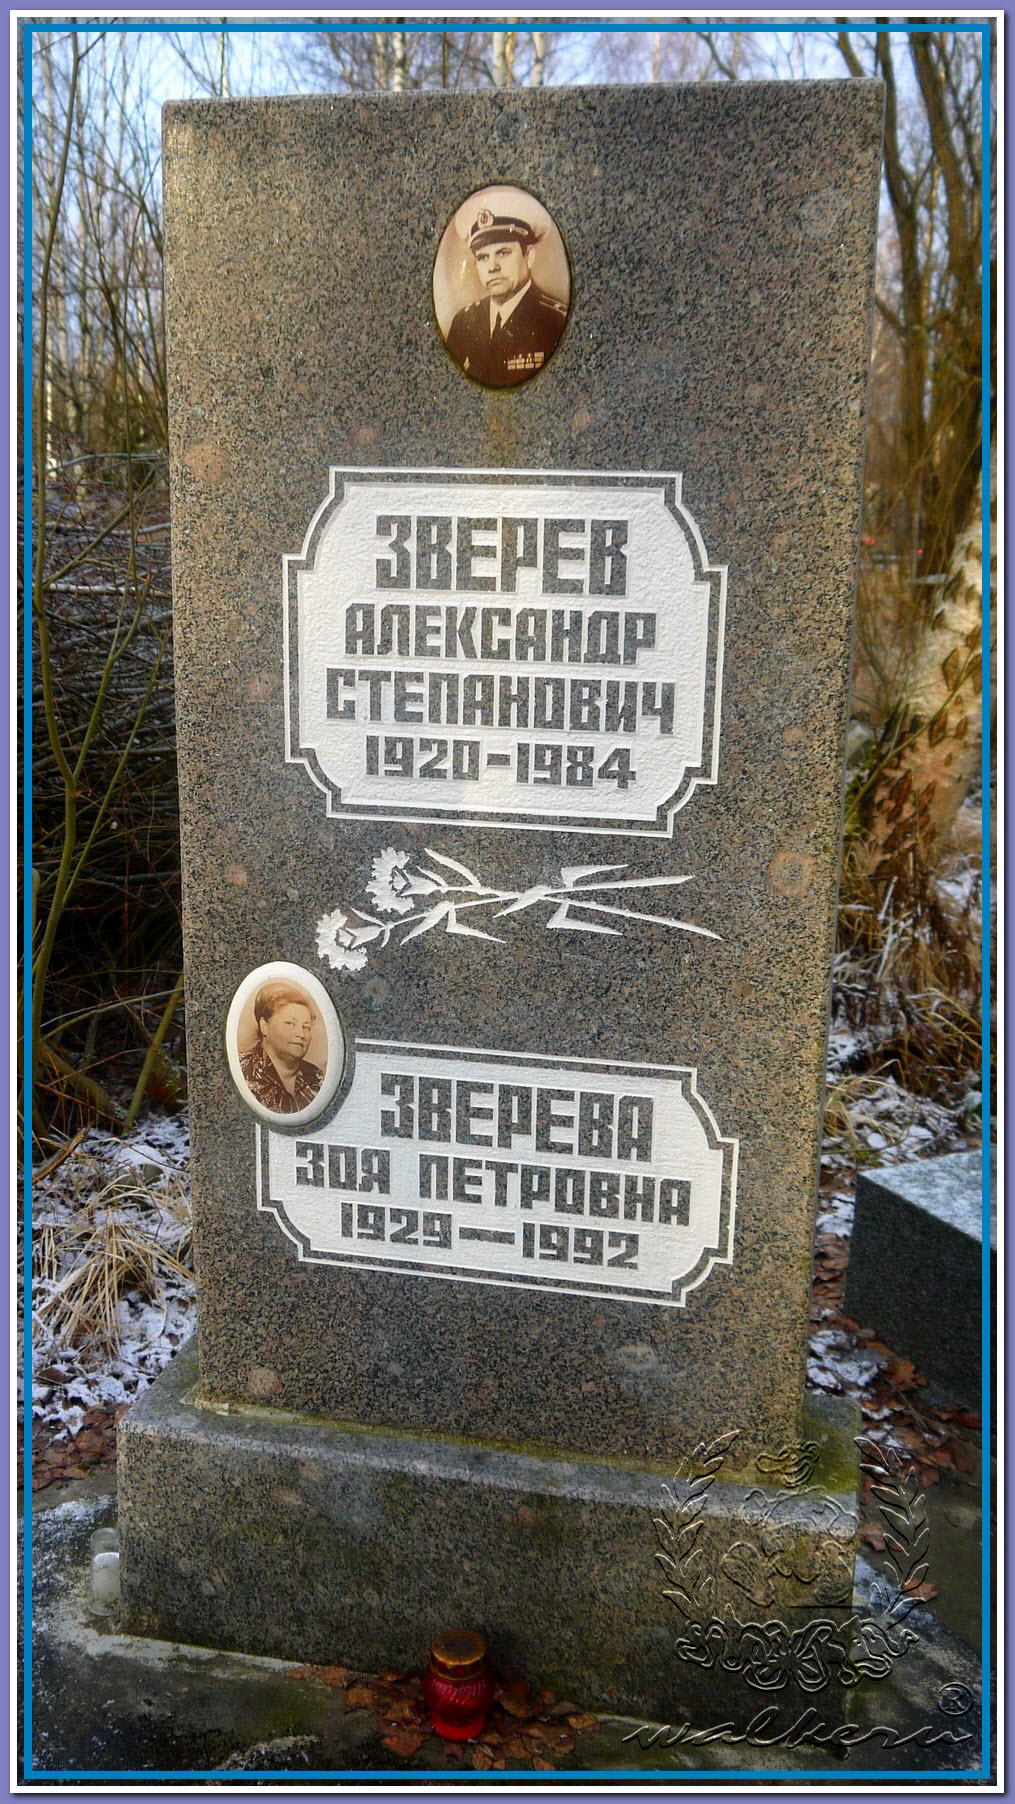 Зверев Александр Степанович